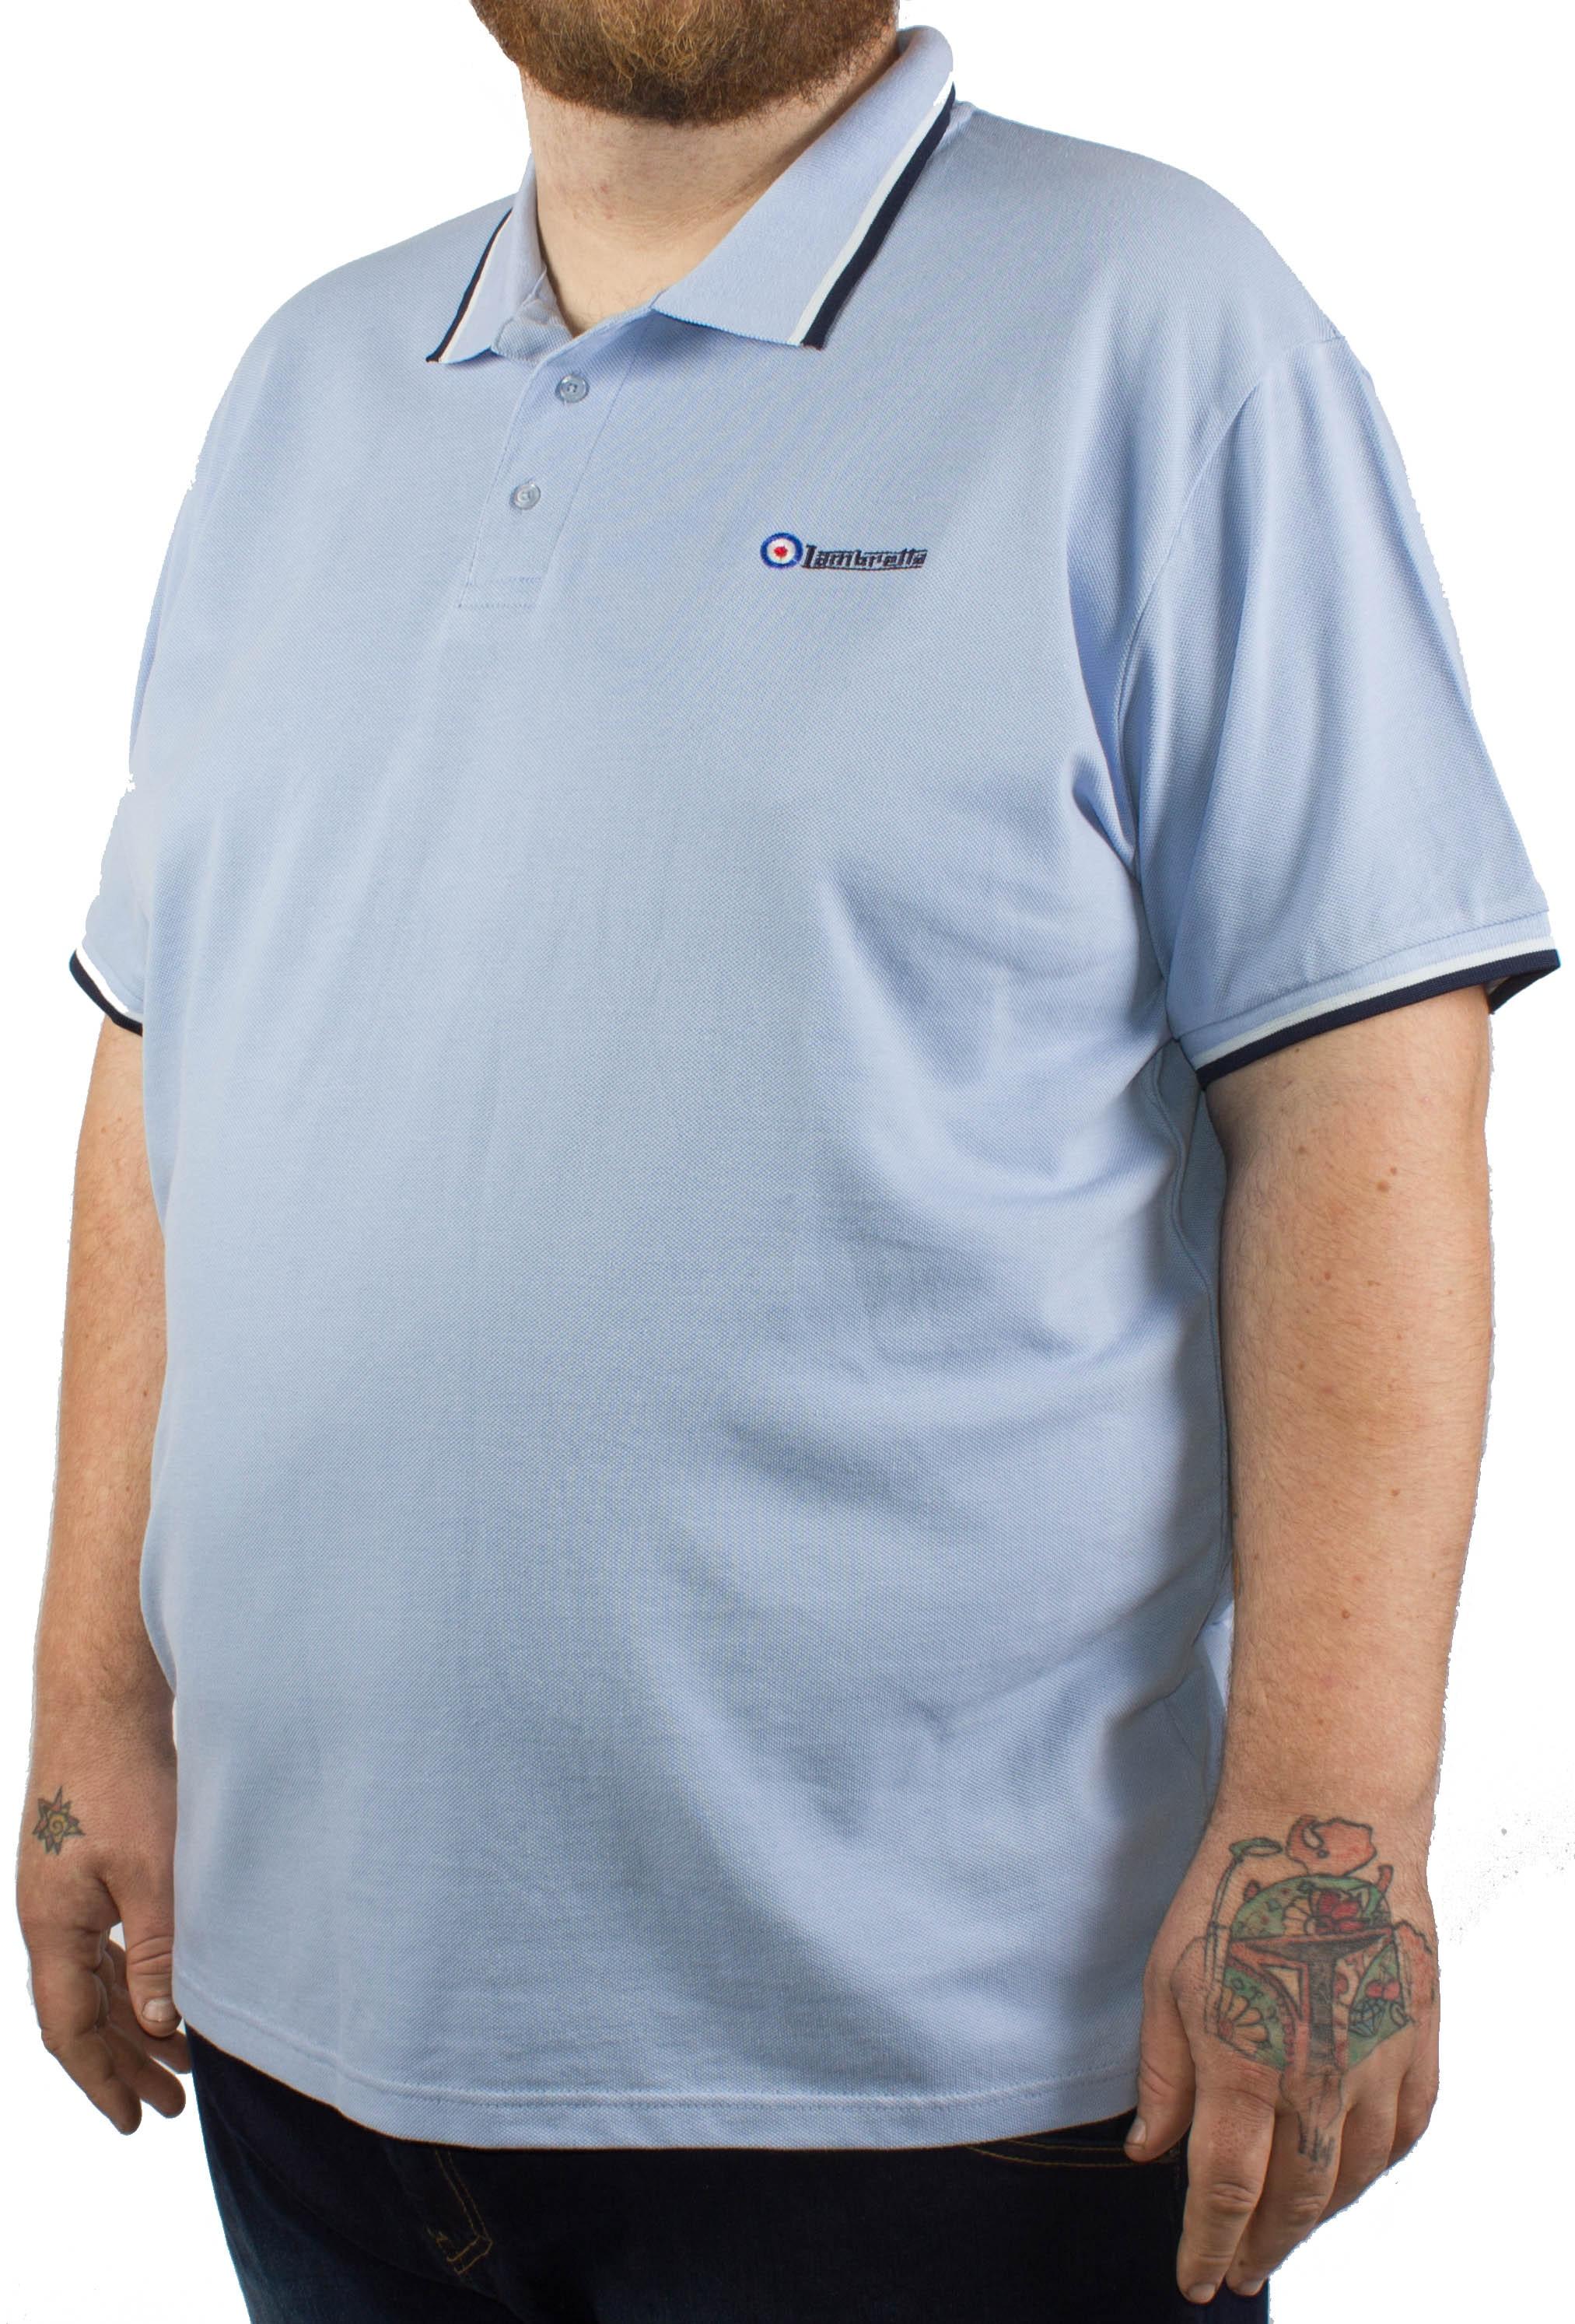 Lambretta PK Polo Shirt Sky Blue